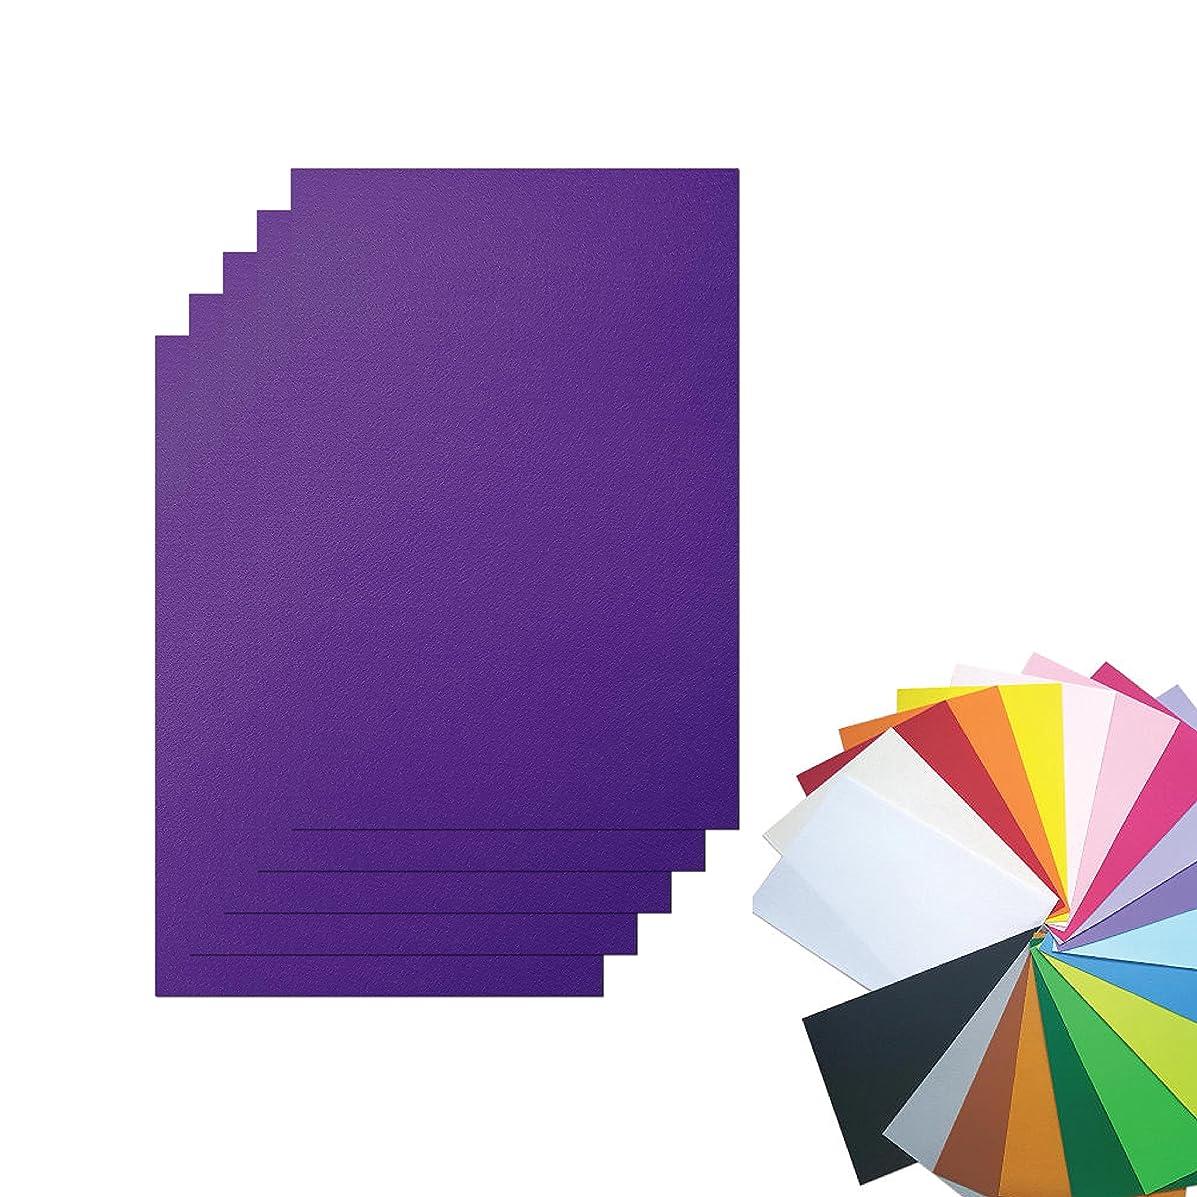 DIY Stiff Felt(Hard Felt) Fabric Squares Sheets Deep Purple Color 30cm X 45cm inch for Crafts,1.2mm Thick- Deep Purple Color of 5sheets